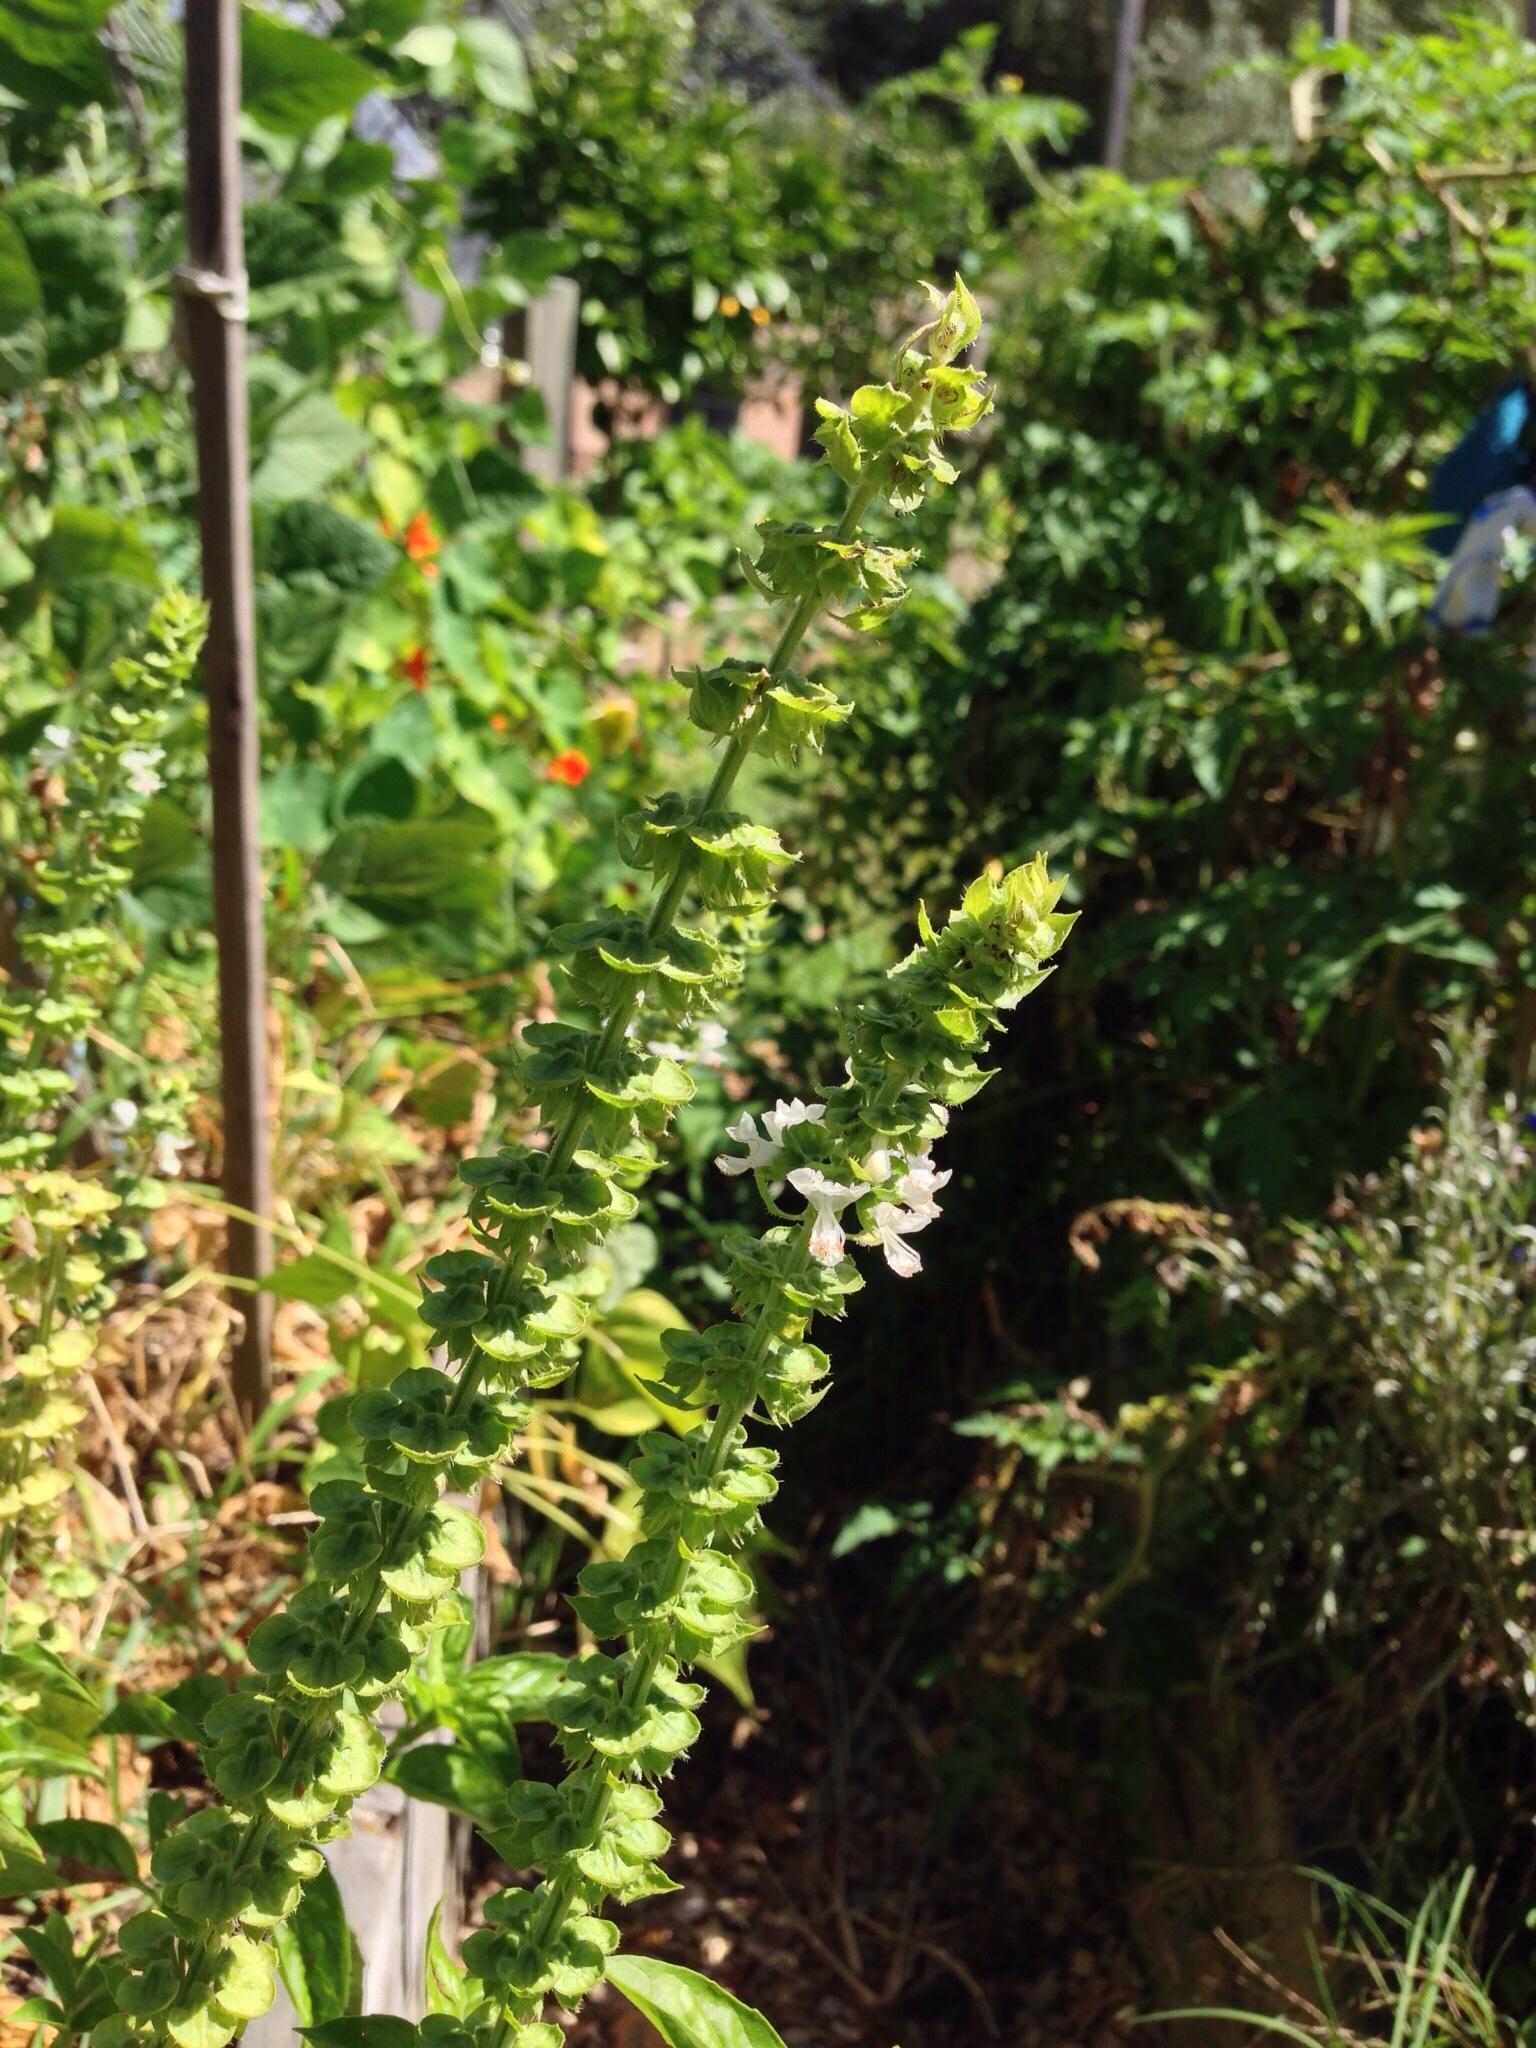 Basil flowering and beginning to set seed